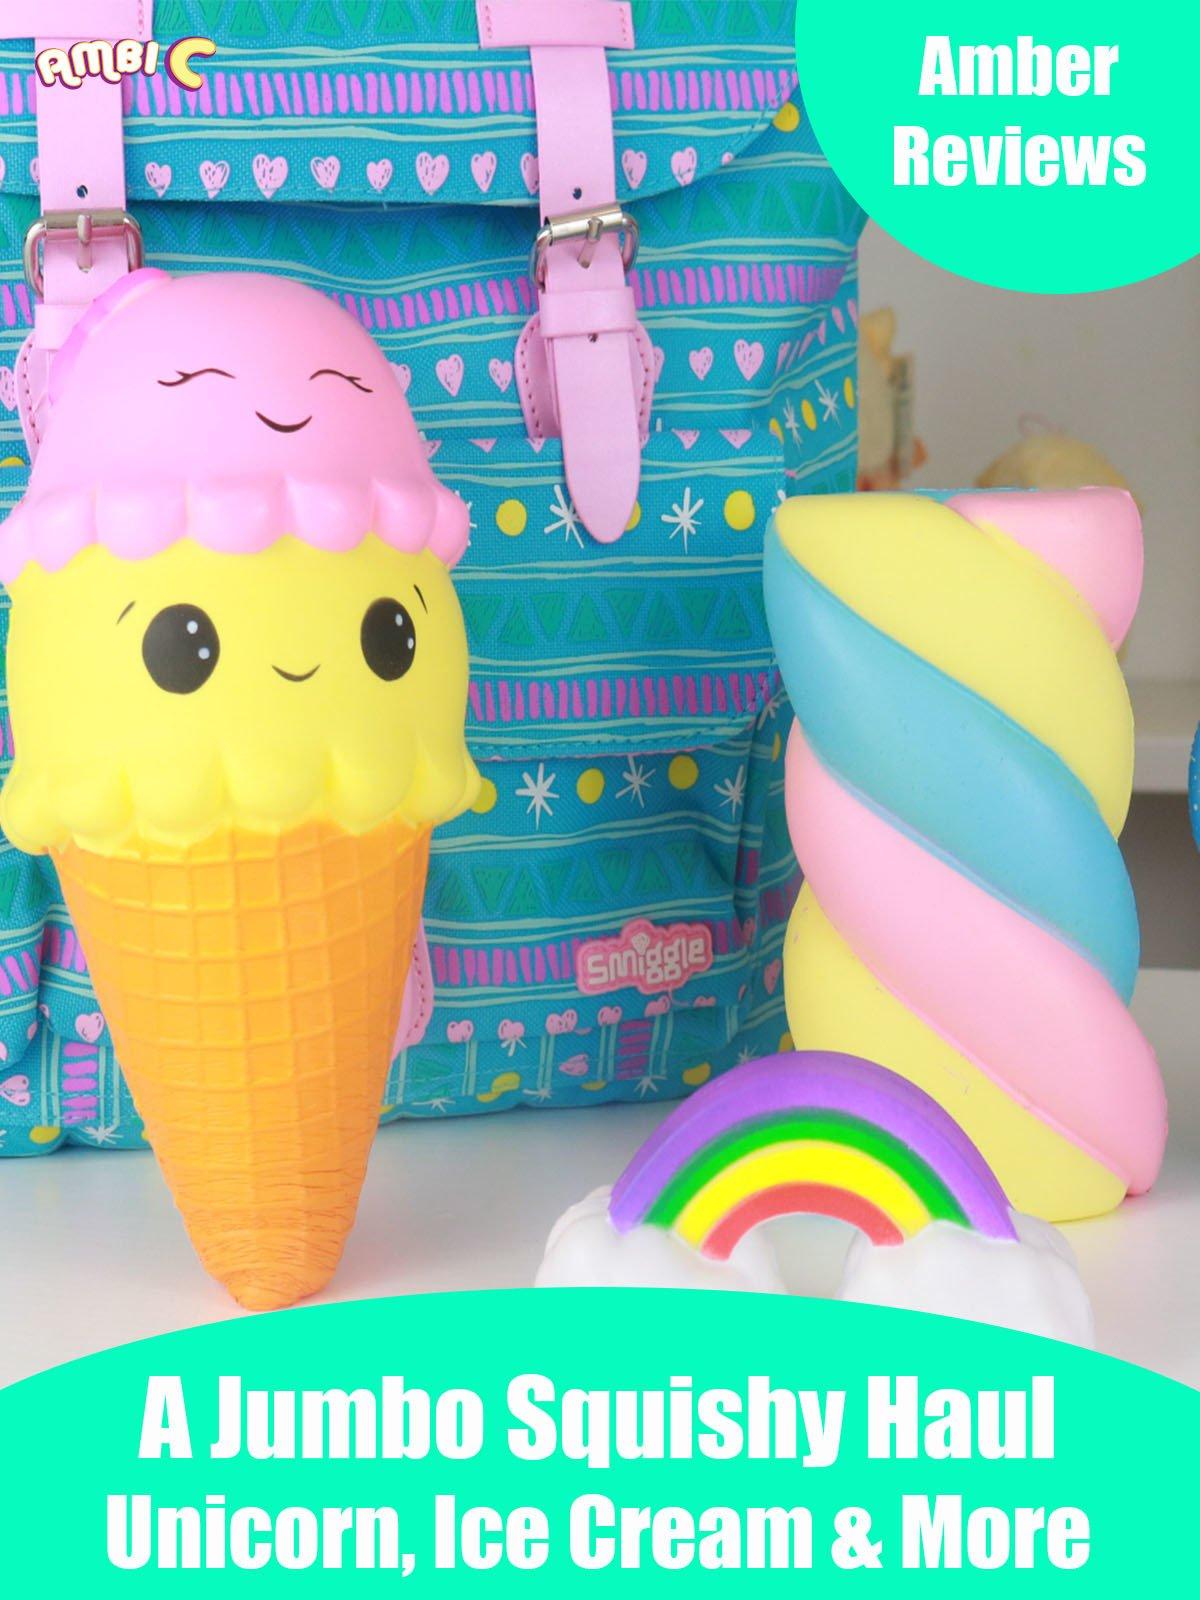 Amber Reviews A Jumbo Squishy Haul Unicorn Ice Cream and More